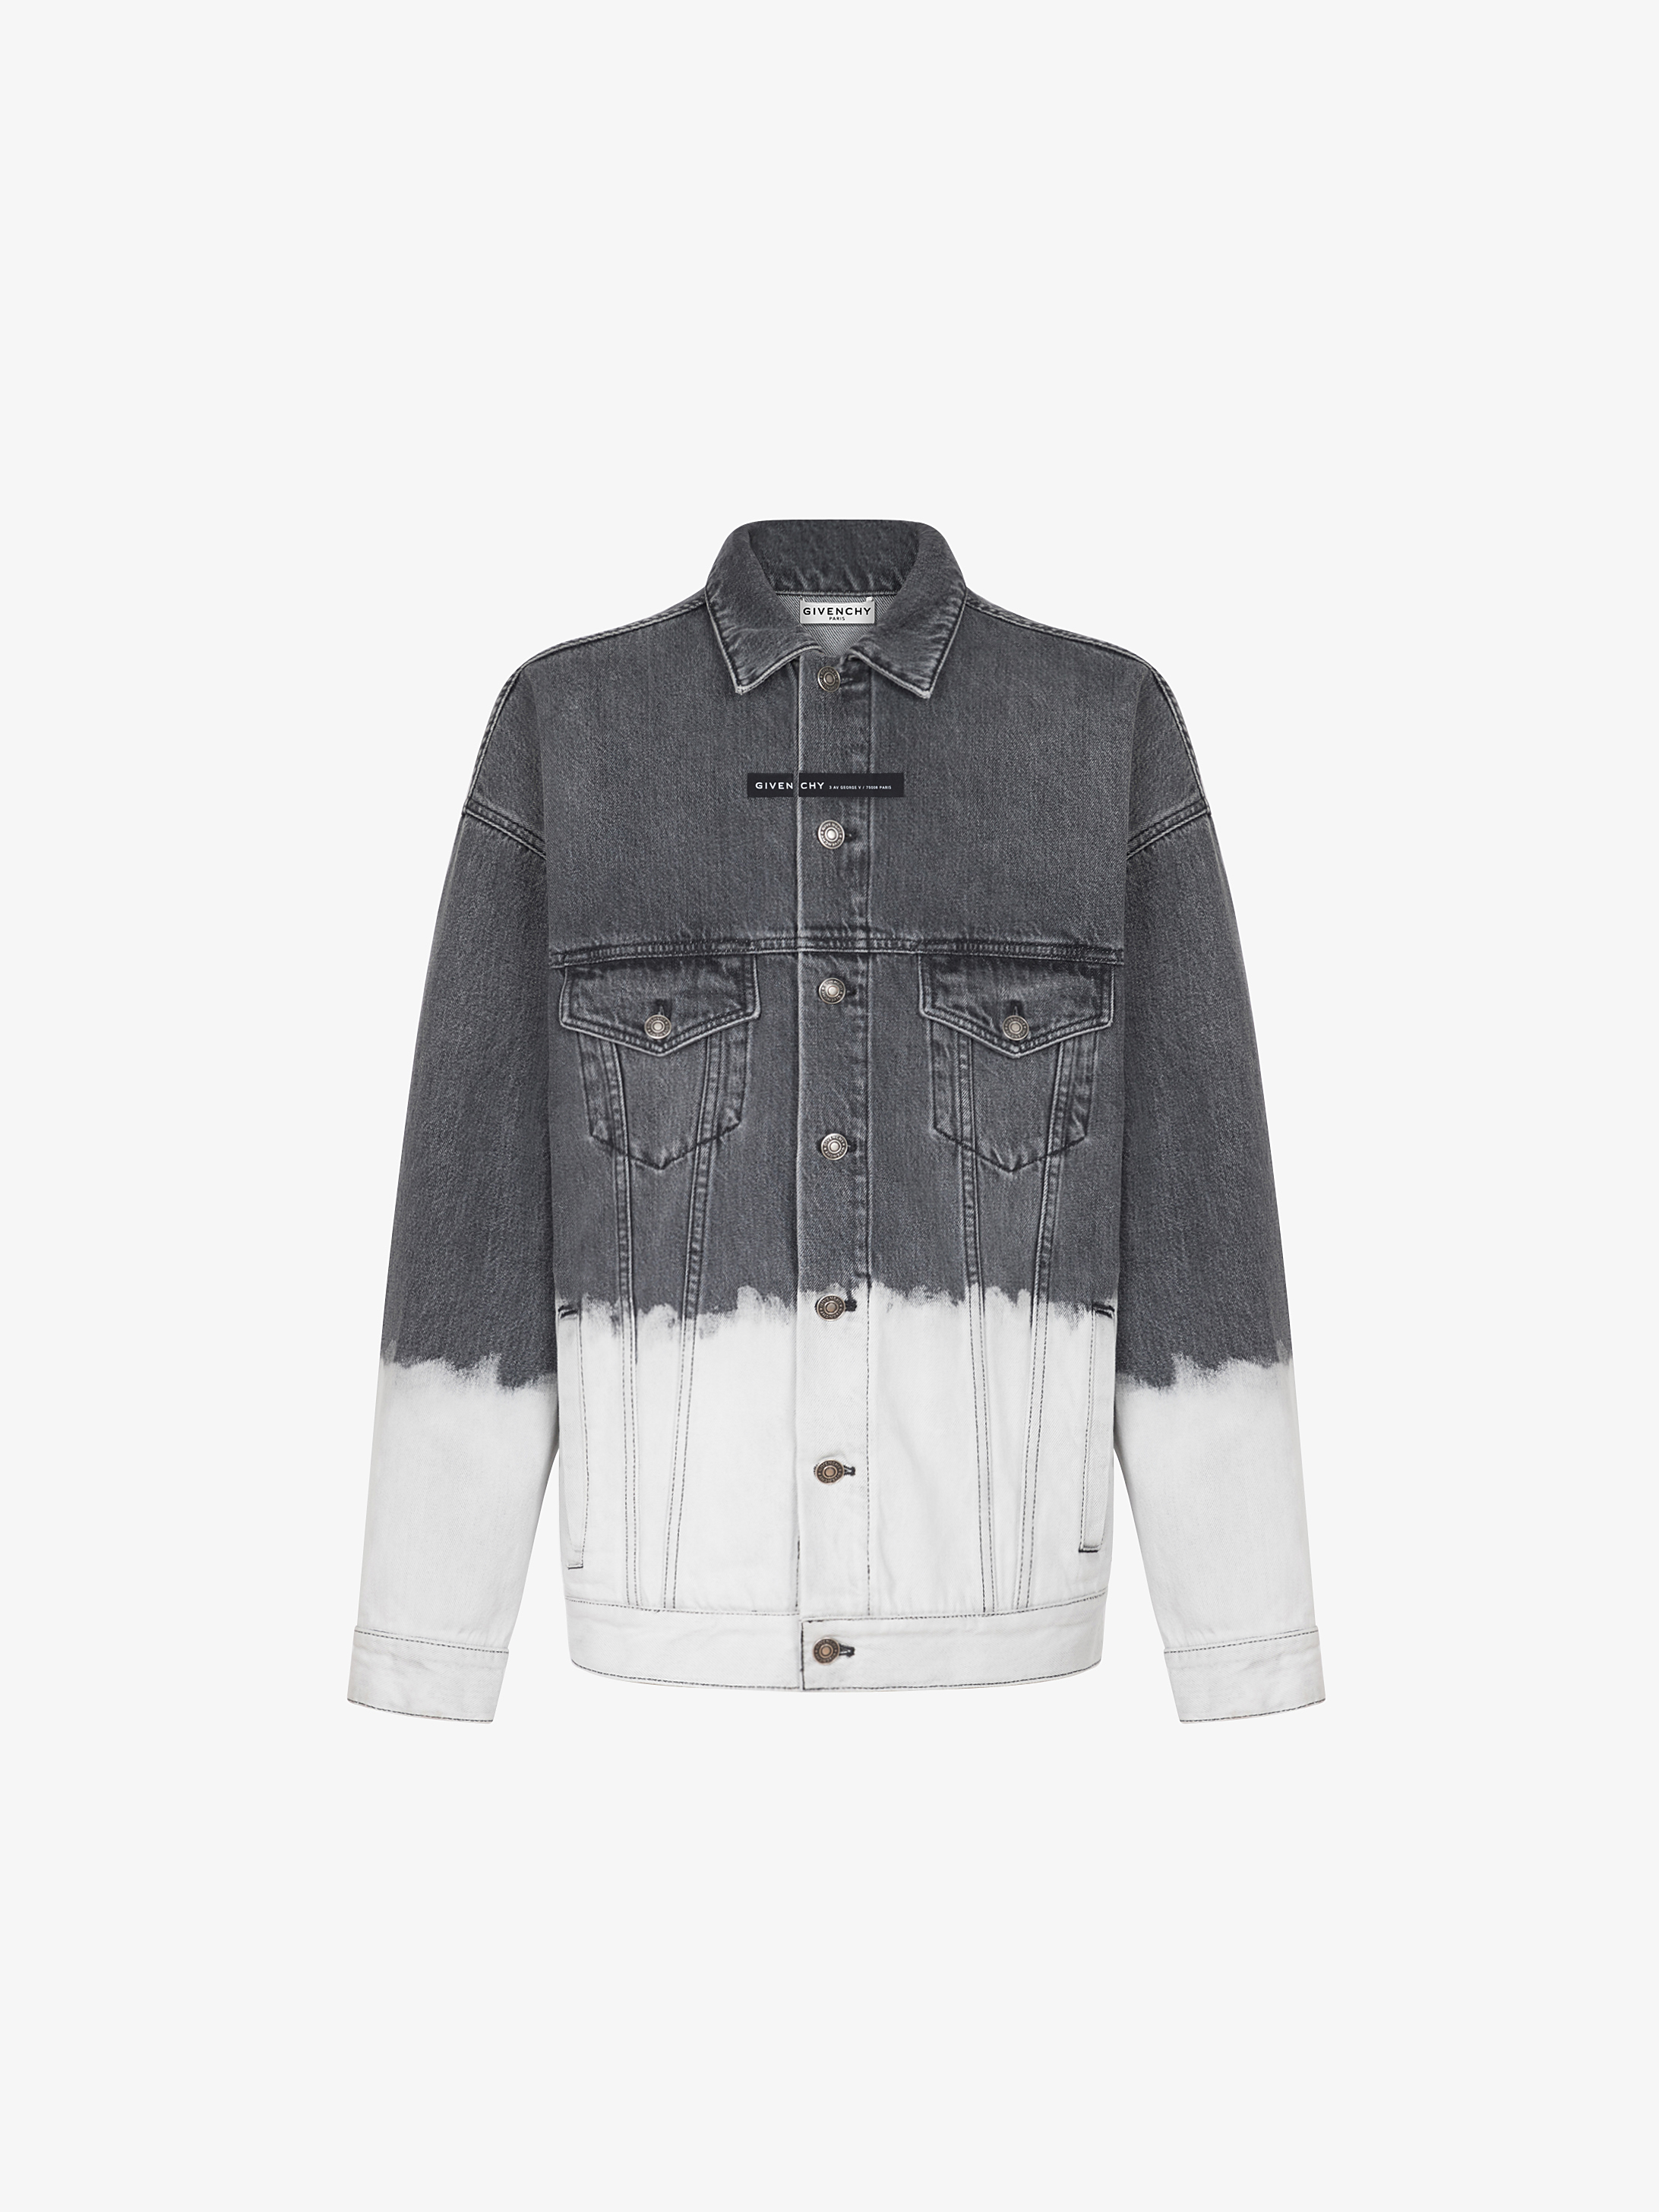 Oversized jacket in two tone denim